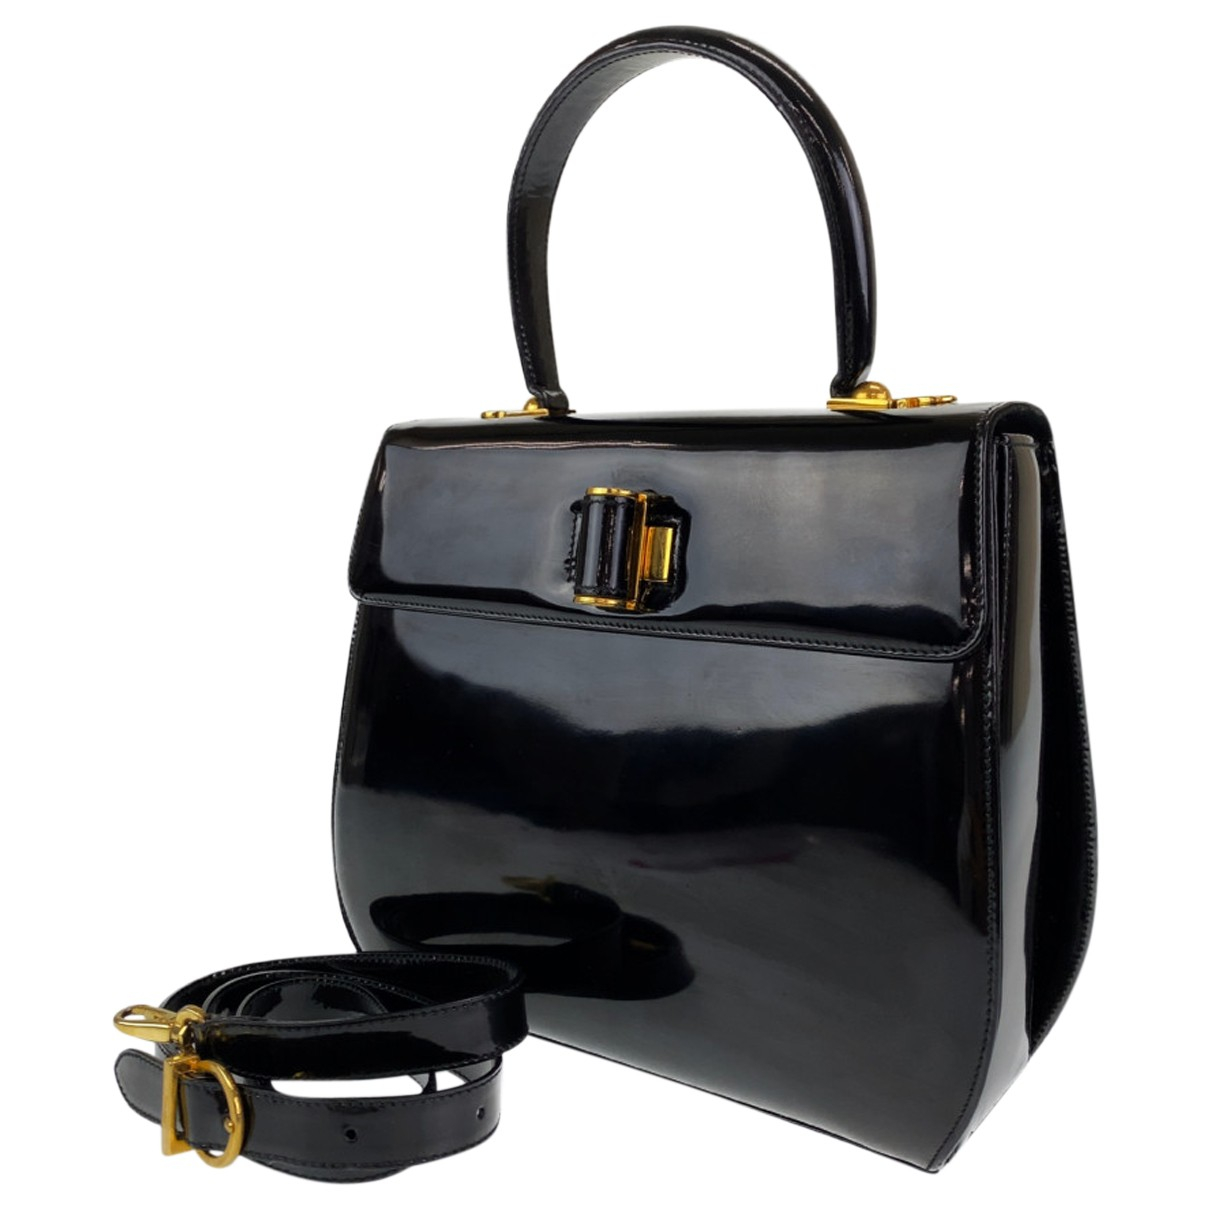 Salvatore Ferragamo N Patent leather handbag for Women N